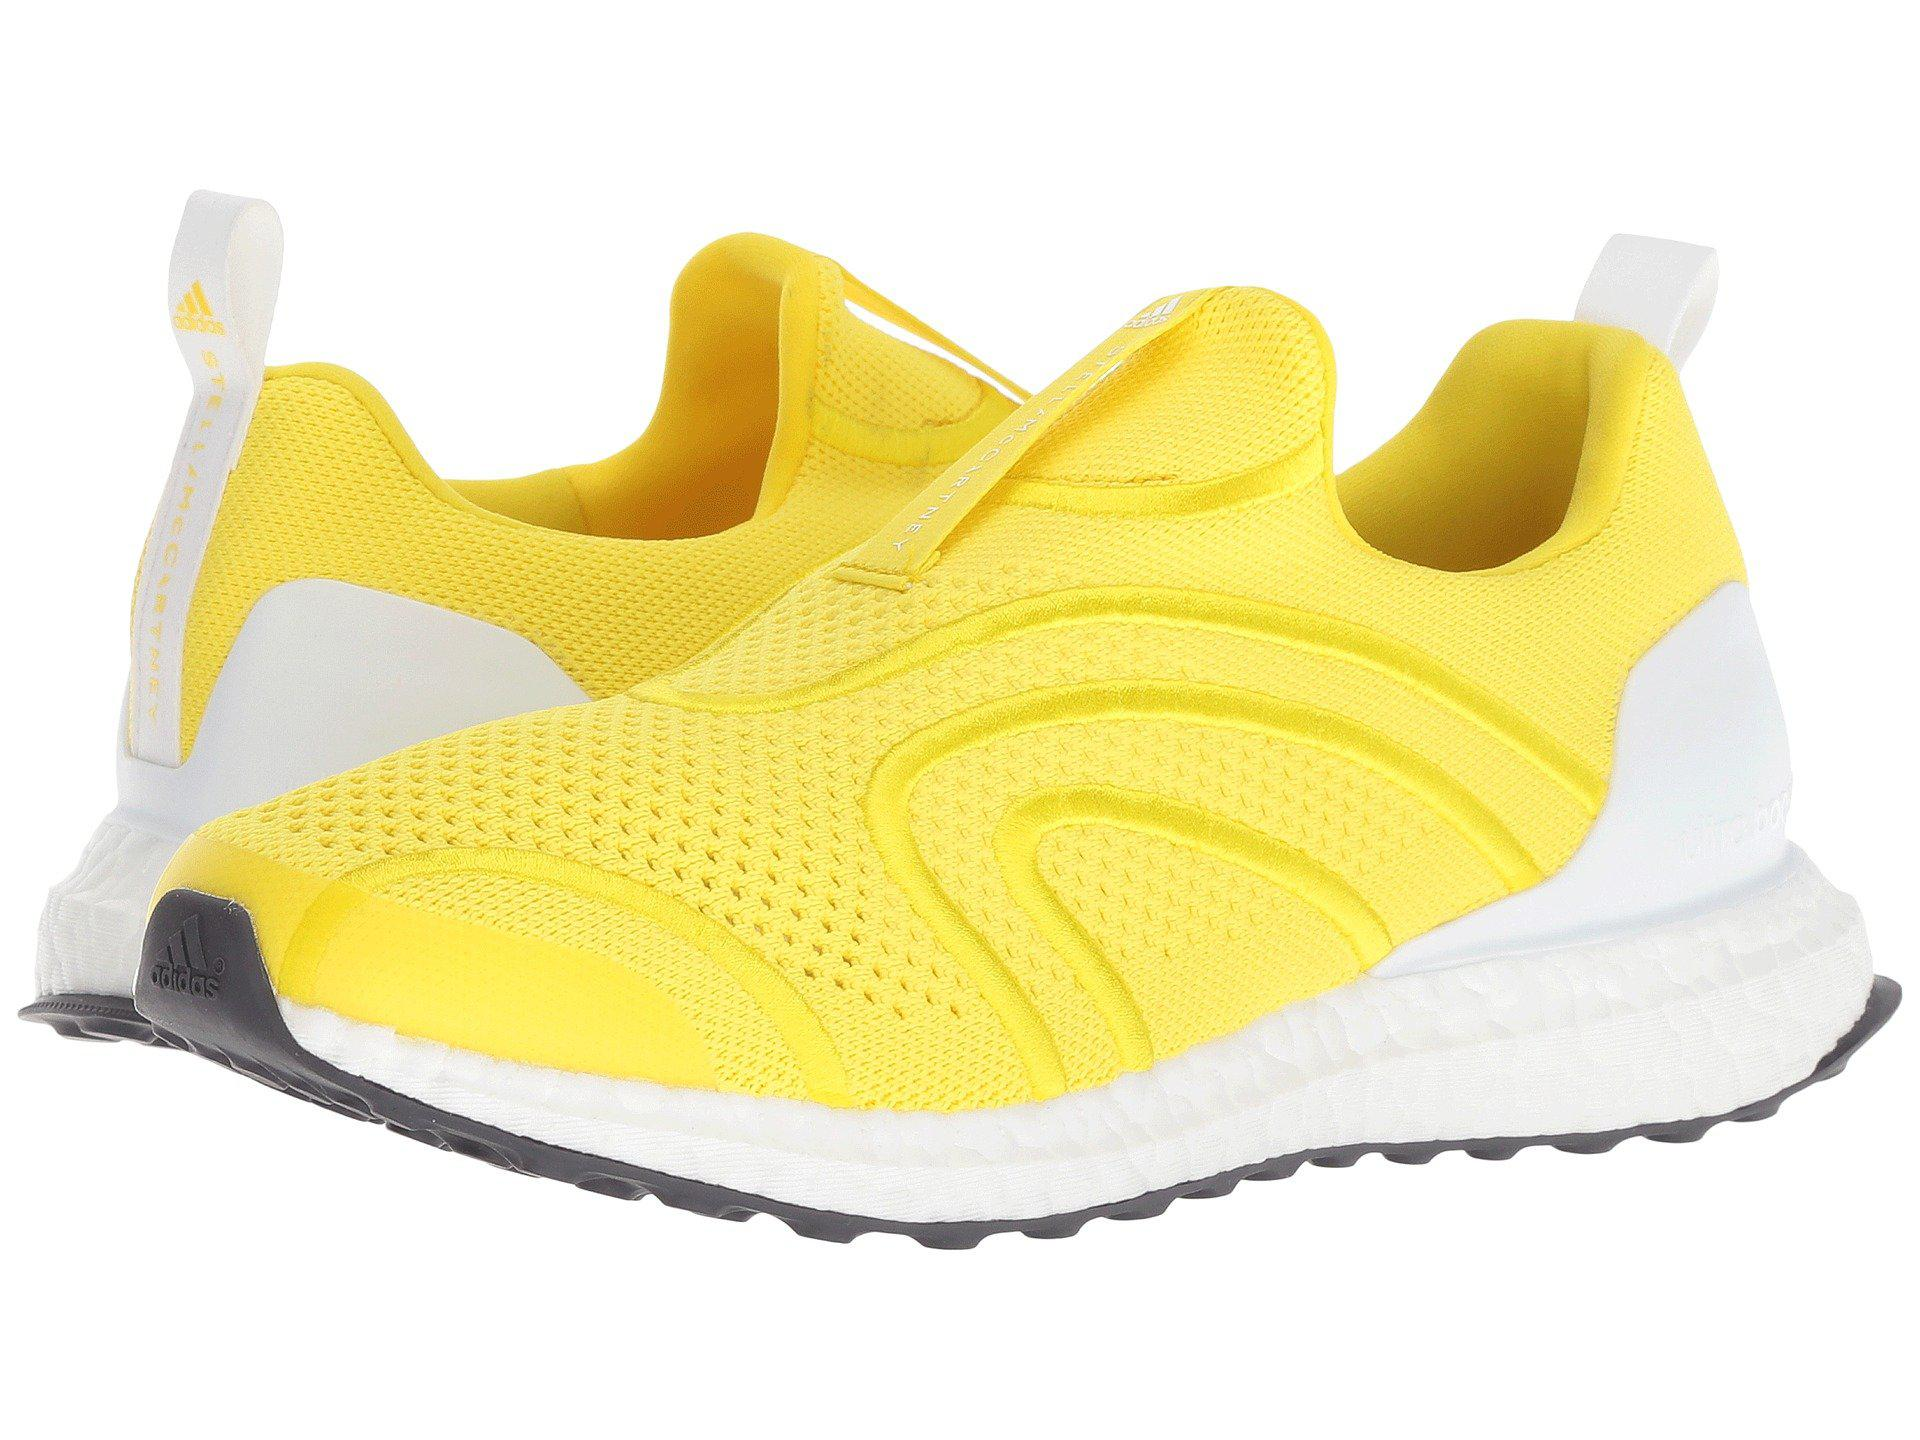 1407910ac5c11 Lyst - adidas By Stella McCartney Ultraboost Uncaged (vivid Yellow ...